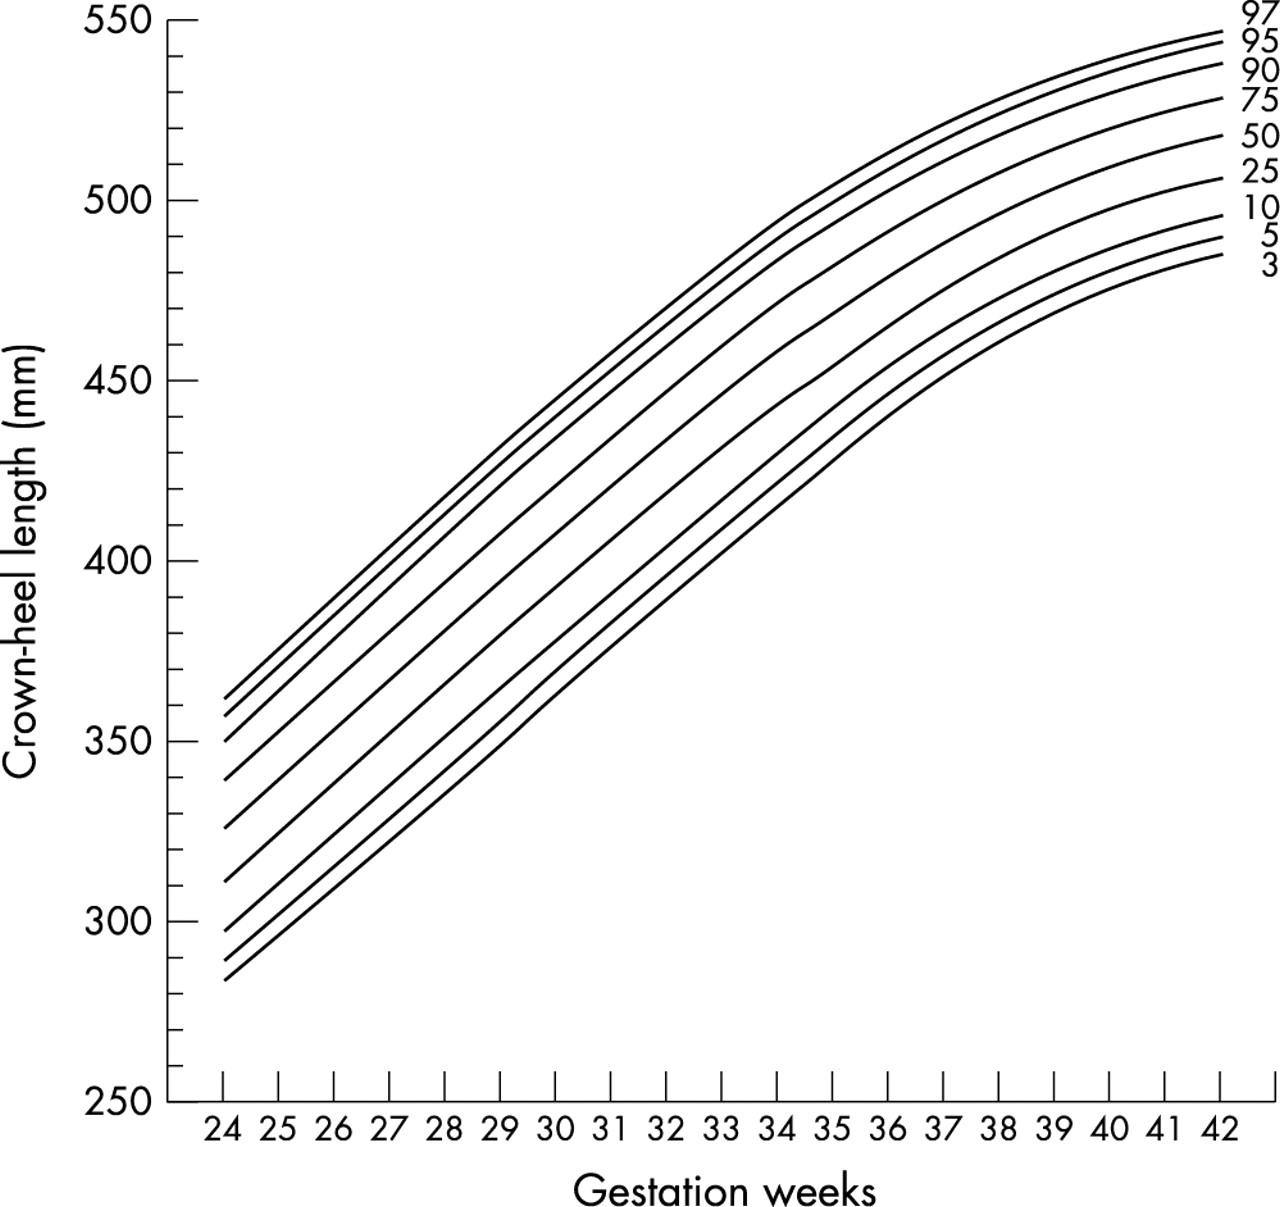 Updated gestational age specific birth weight, crown-heel